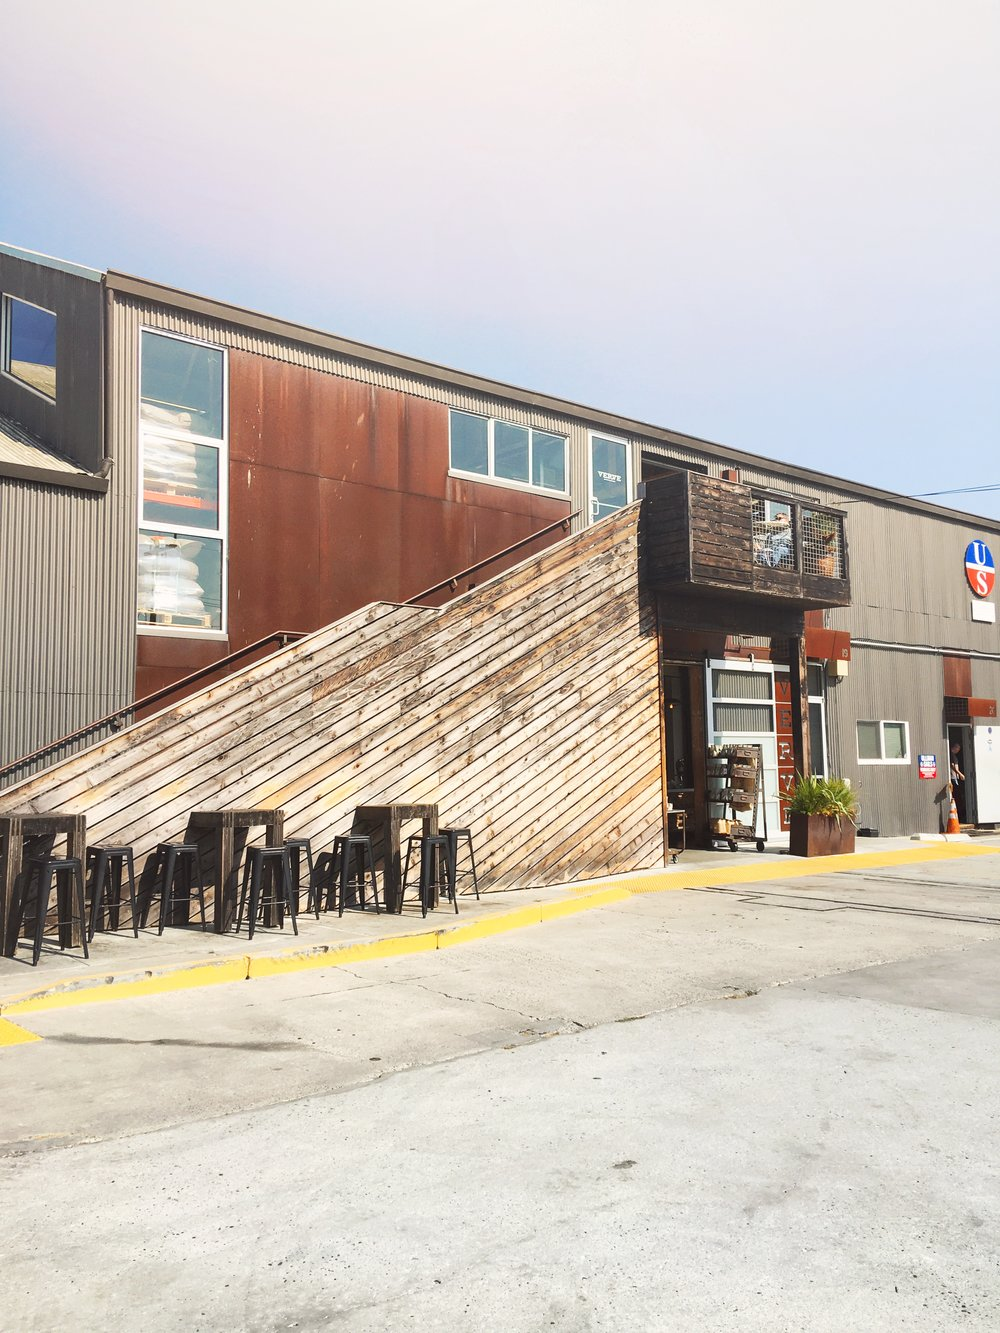 Verve Coffee Roasters Warehouse in Santa Cruz, CA